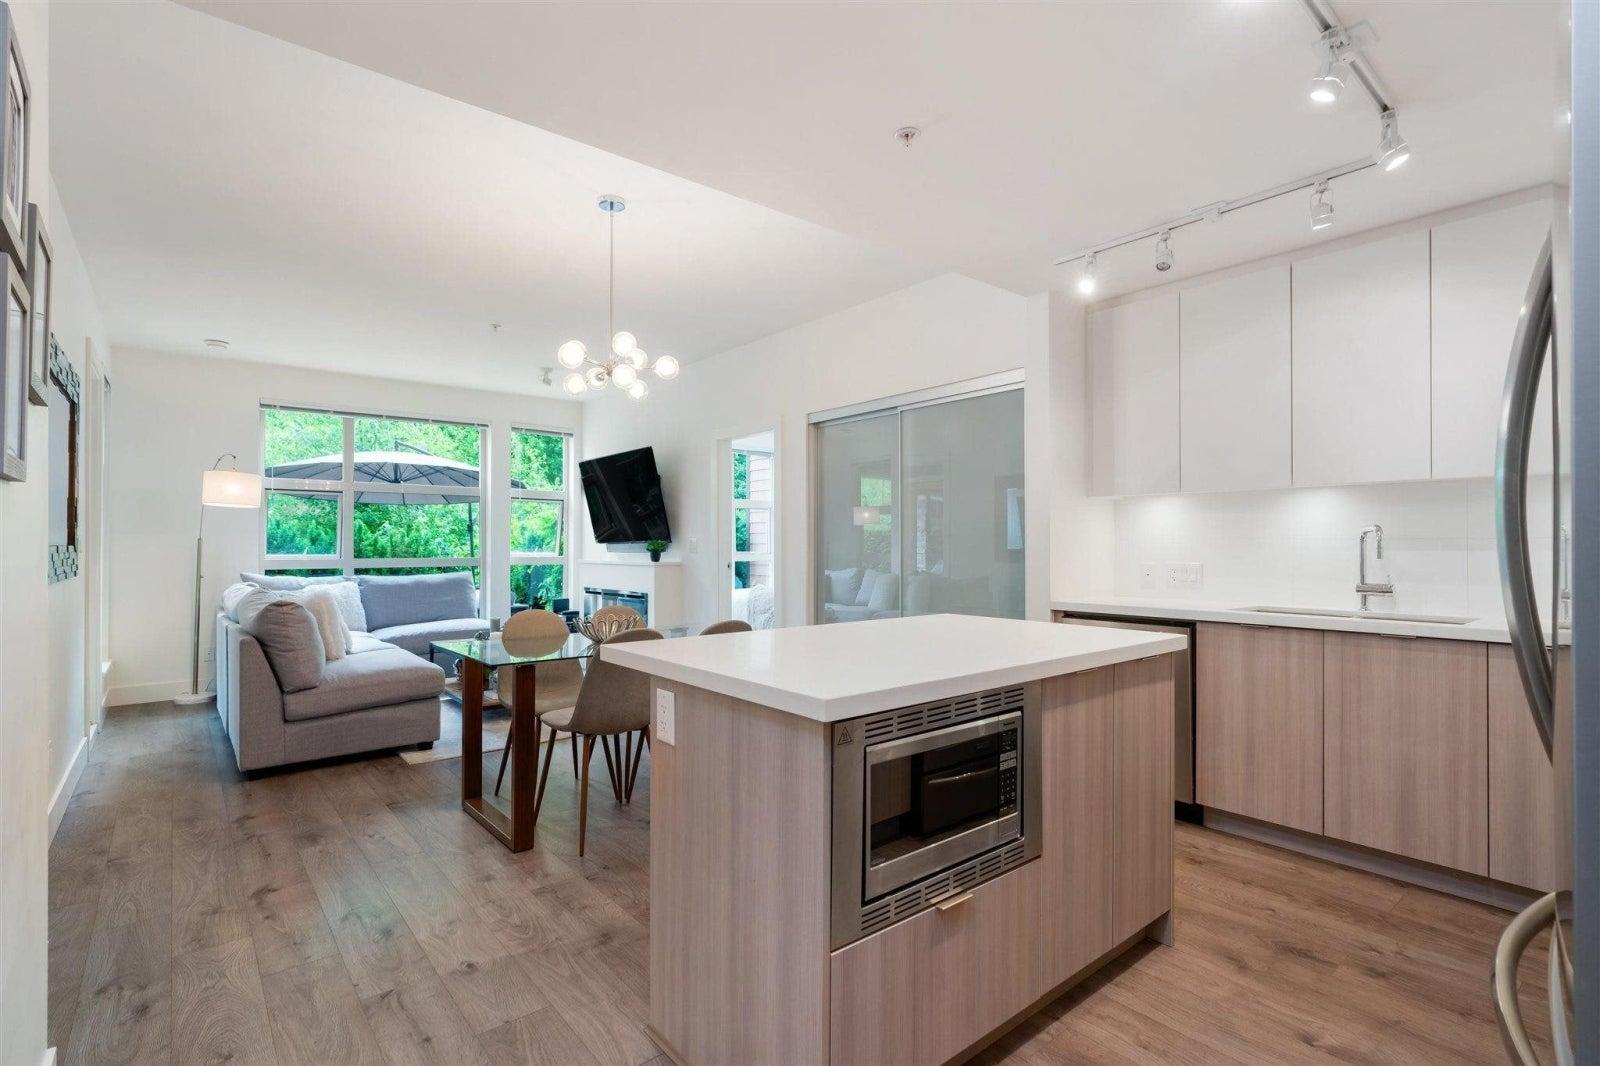 222 3602 ALDERCREST DRIVE - Roche Point Apartment/Condo for sale, 2 Bedrooms (R2603975) #10